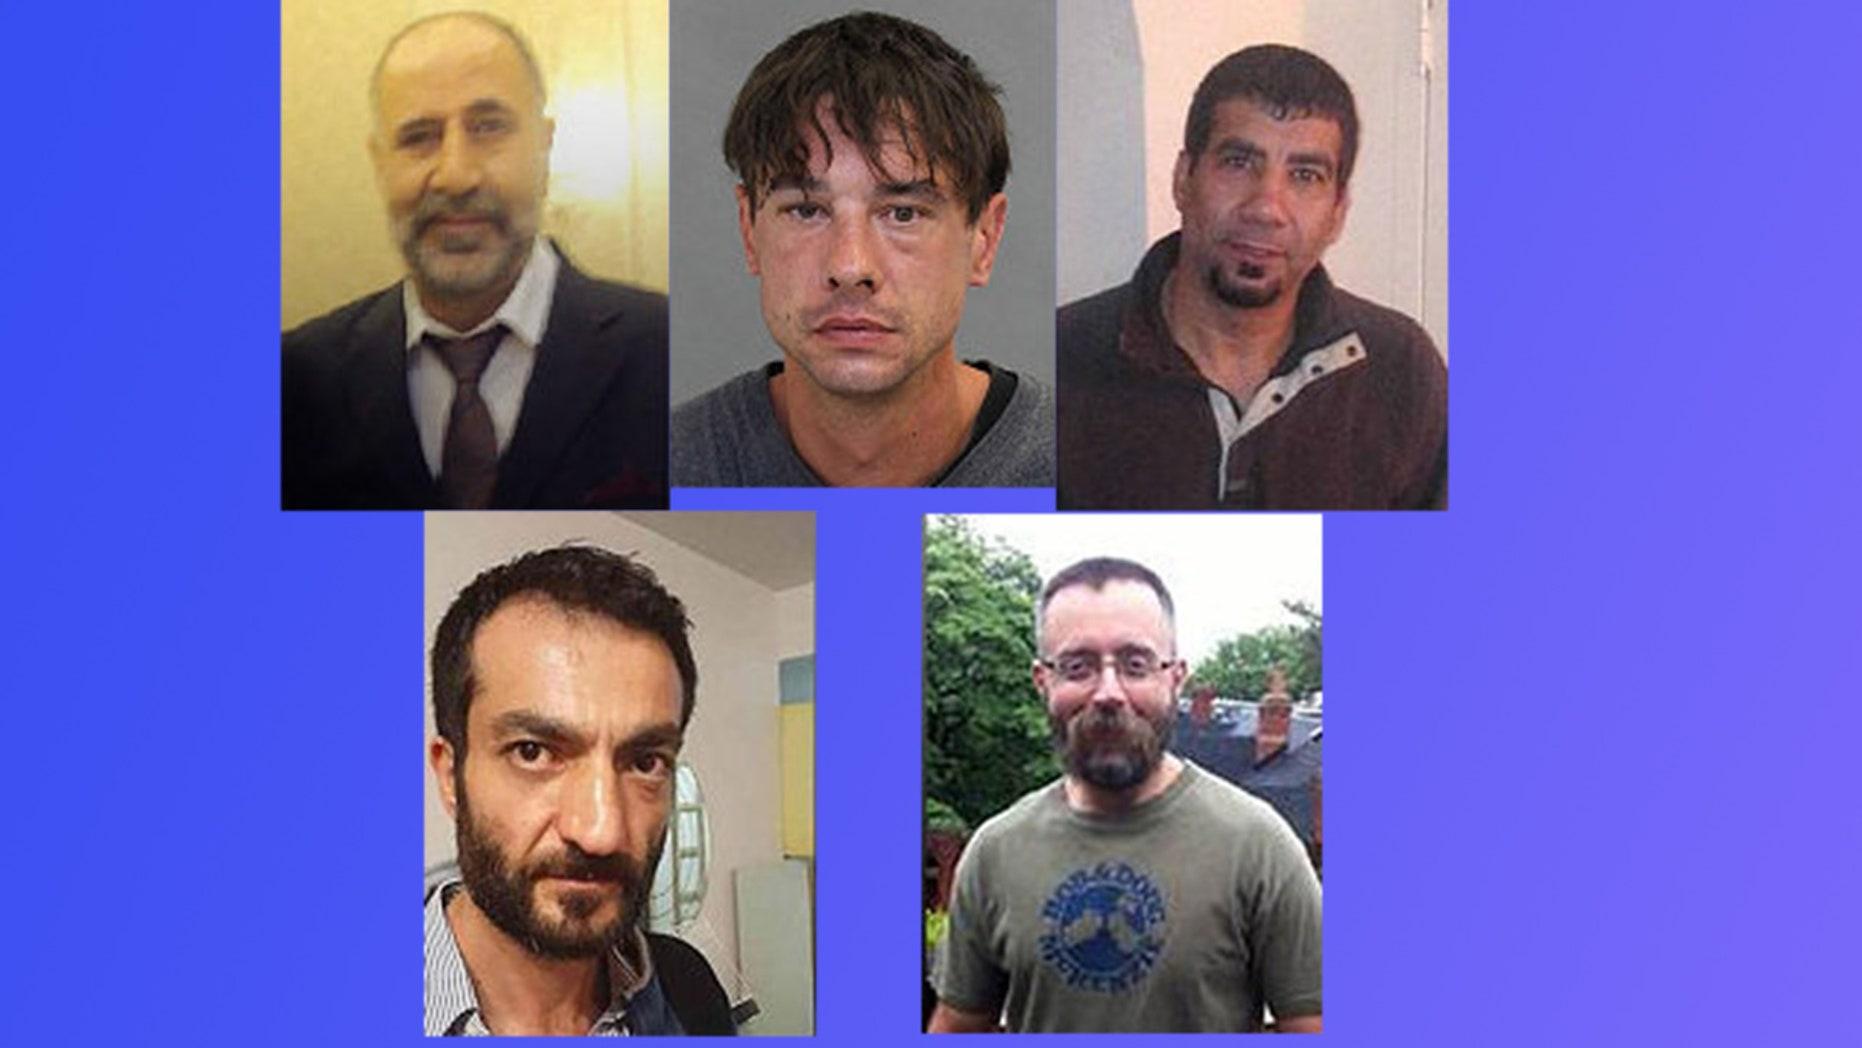 Clockwise from left: Majeed Kayhan, 58; Dean Lisowick, 47; Soroush Marmudi, 50; Selim Esen, 44 and Andrew Kinsman, 49.